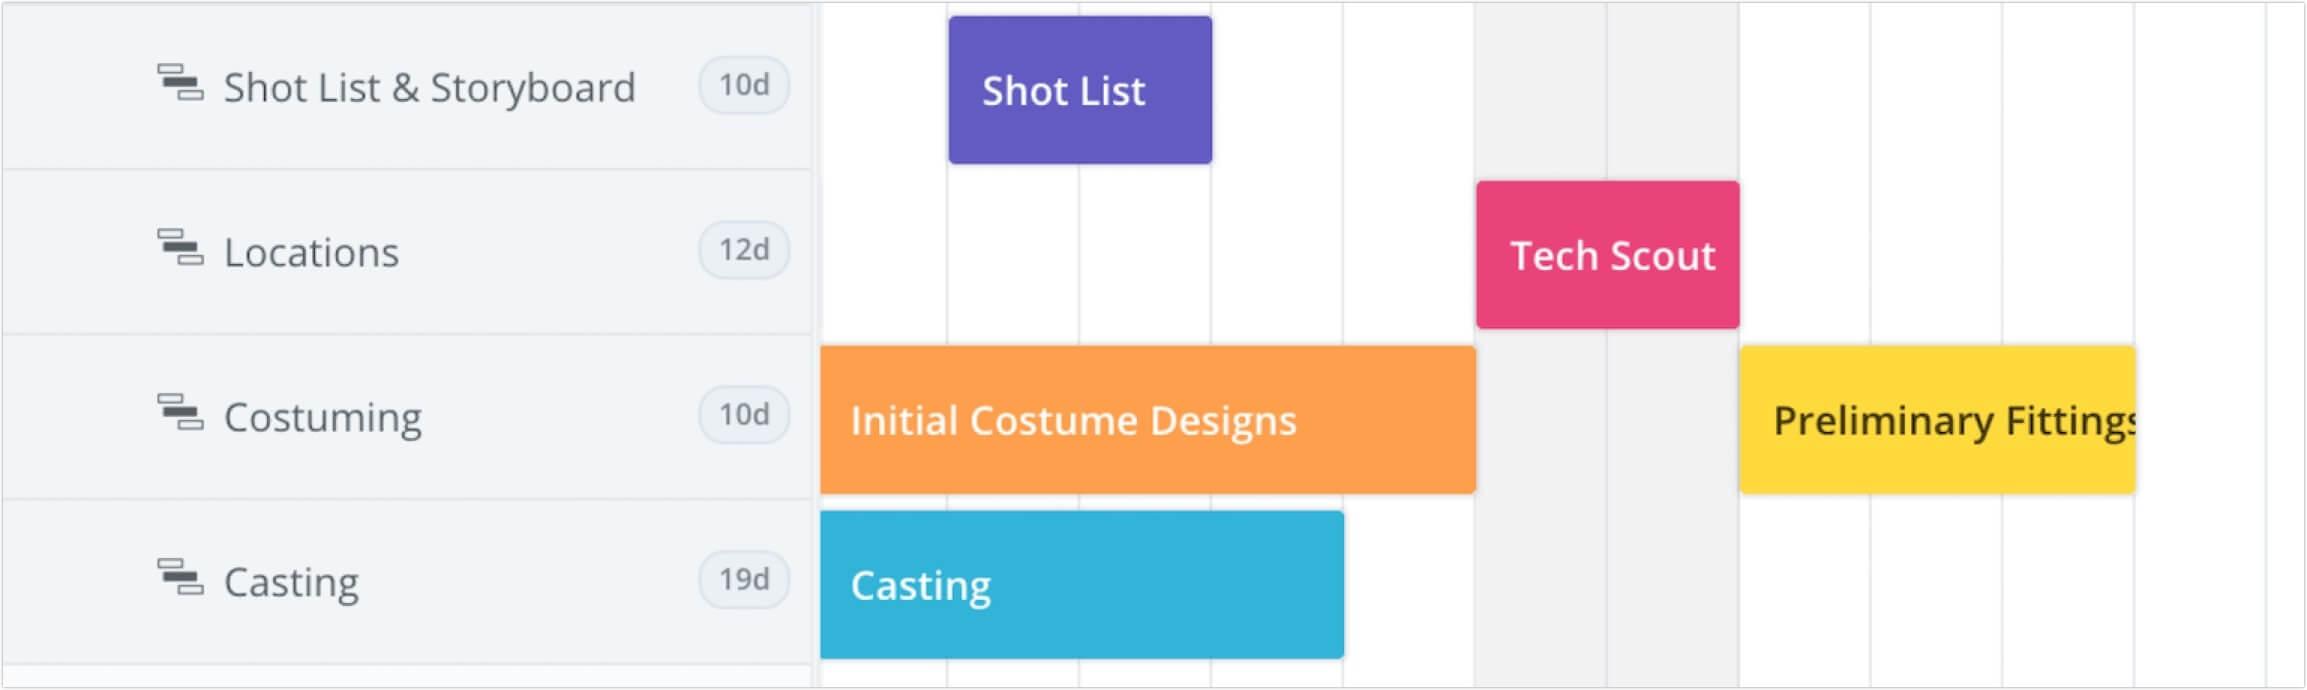 Film, Photo & Production Timeline - Add Events A - StudioBinder